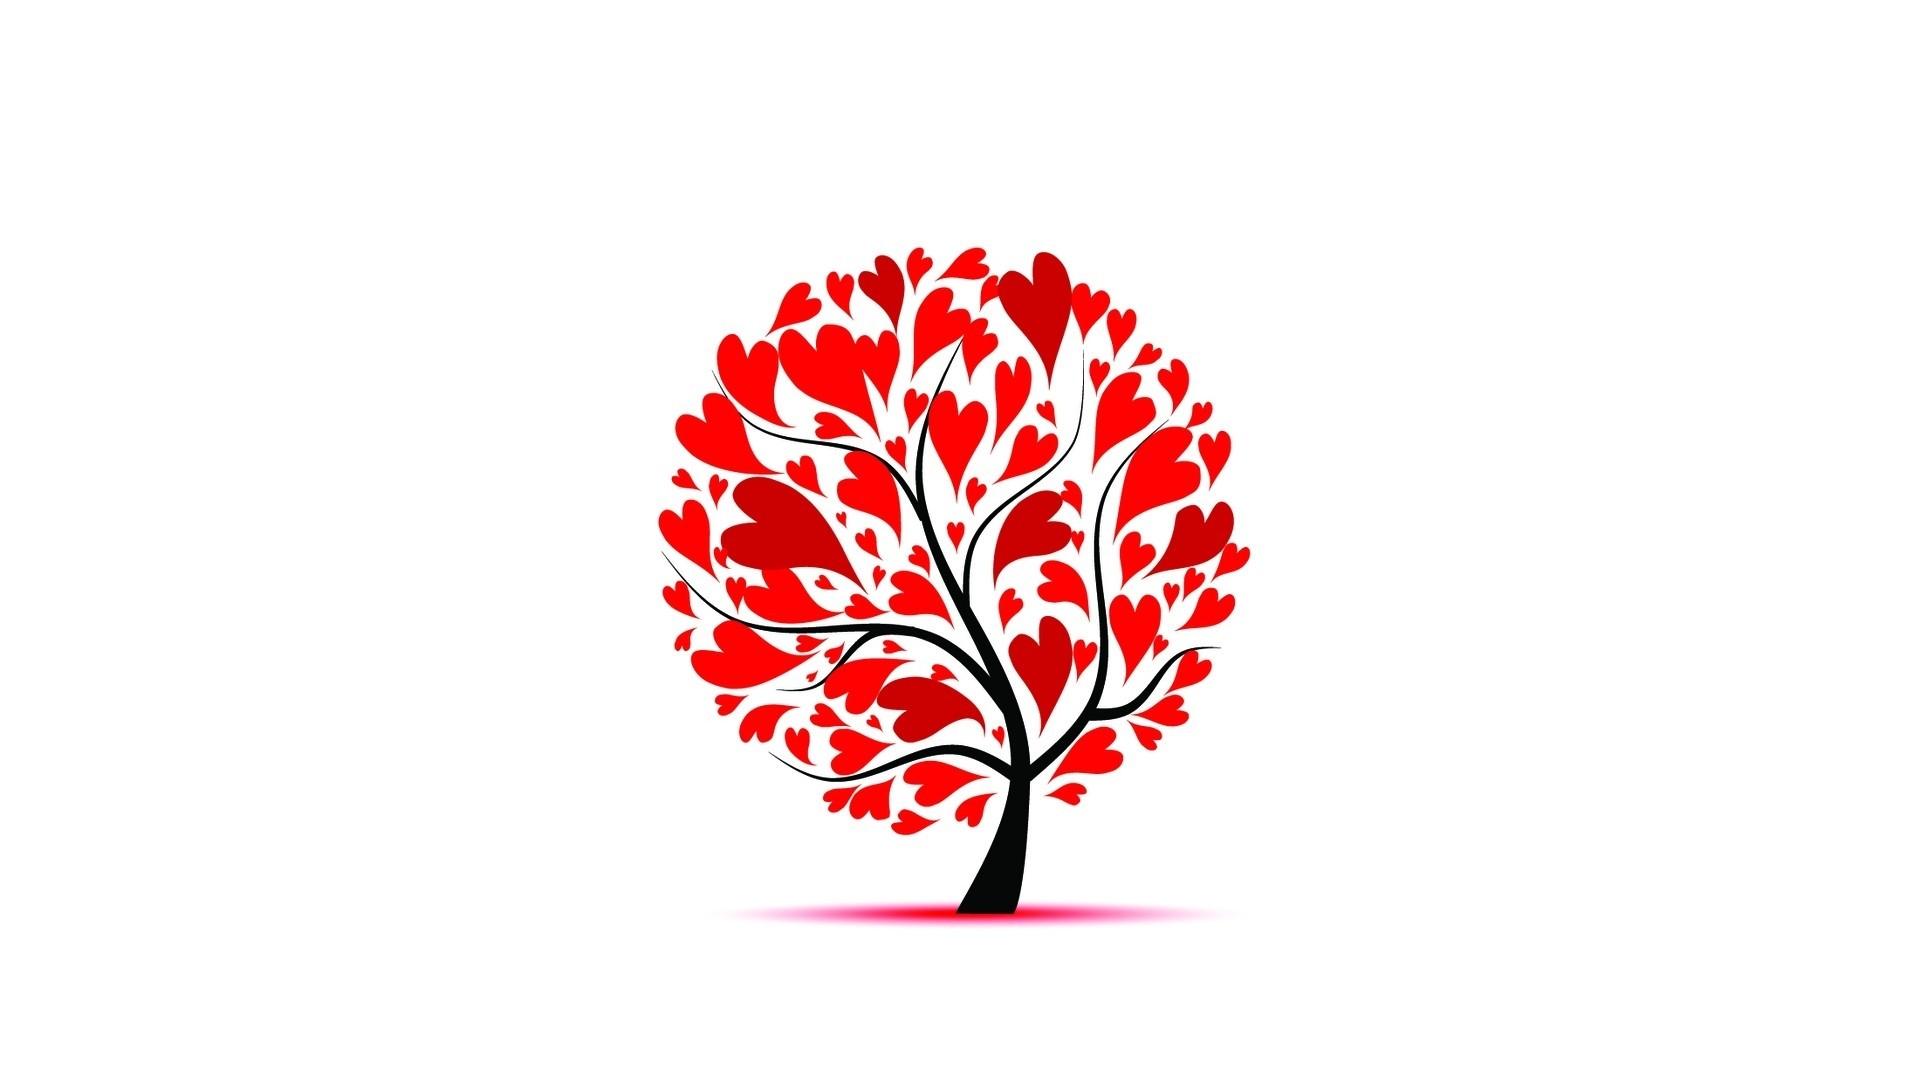 Tree Minimalist High Quality